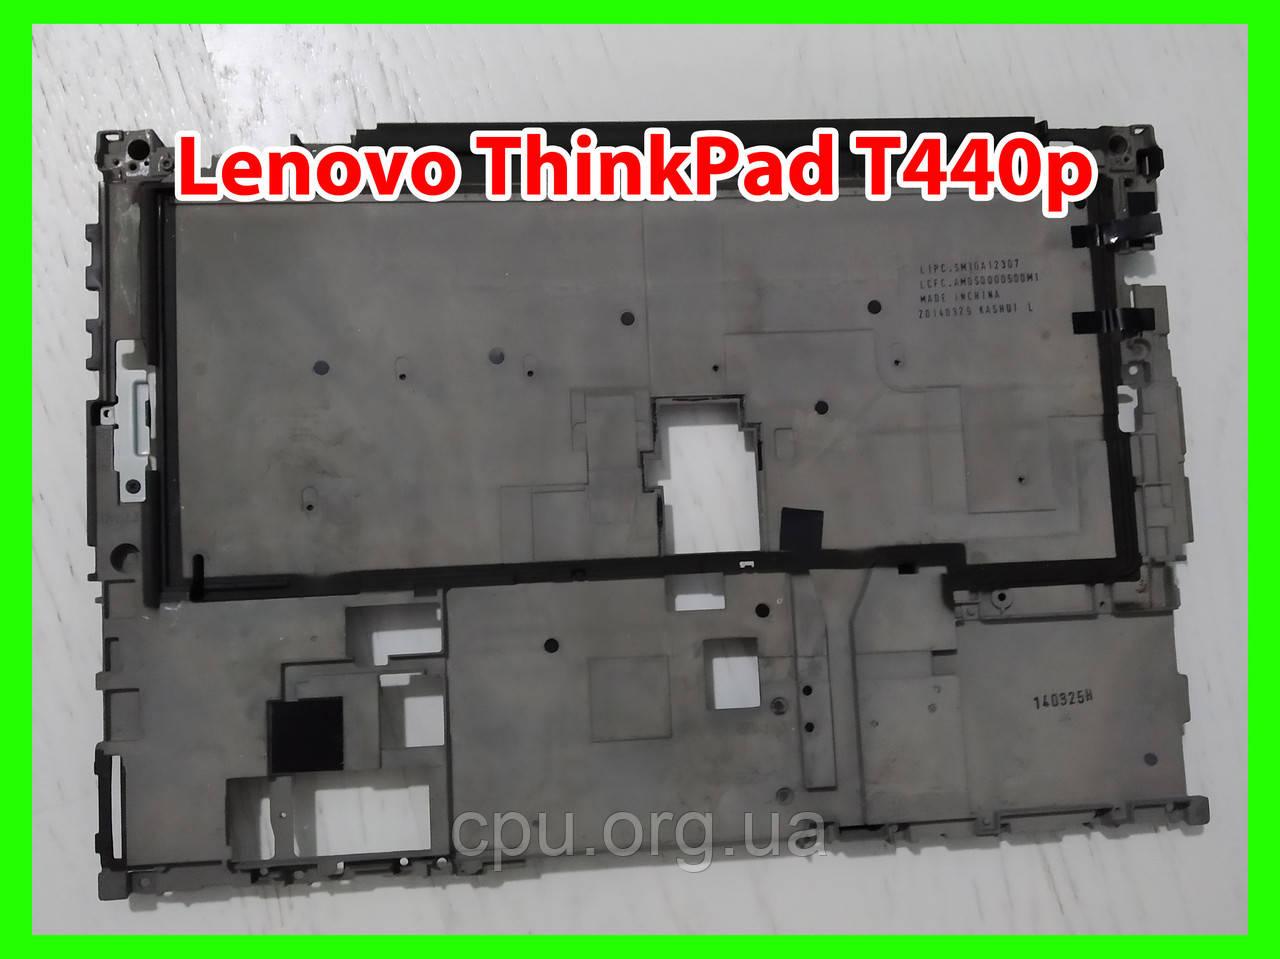 Срудняя часть корпуса Lenovo ThinkPad T440p